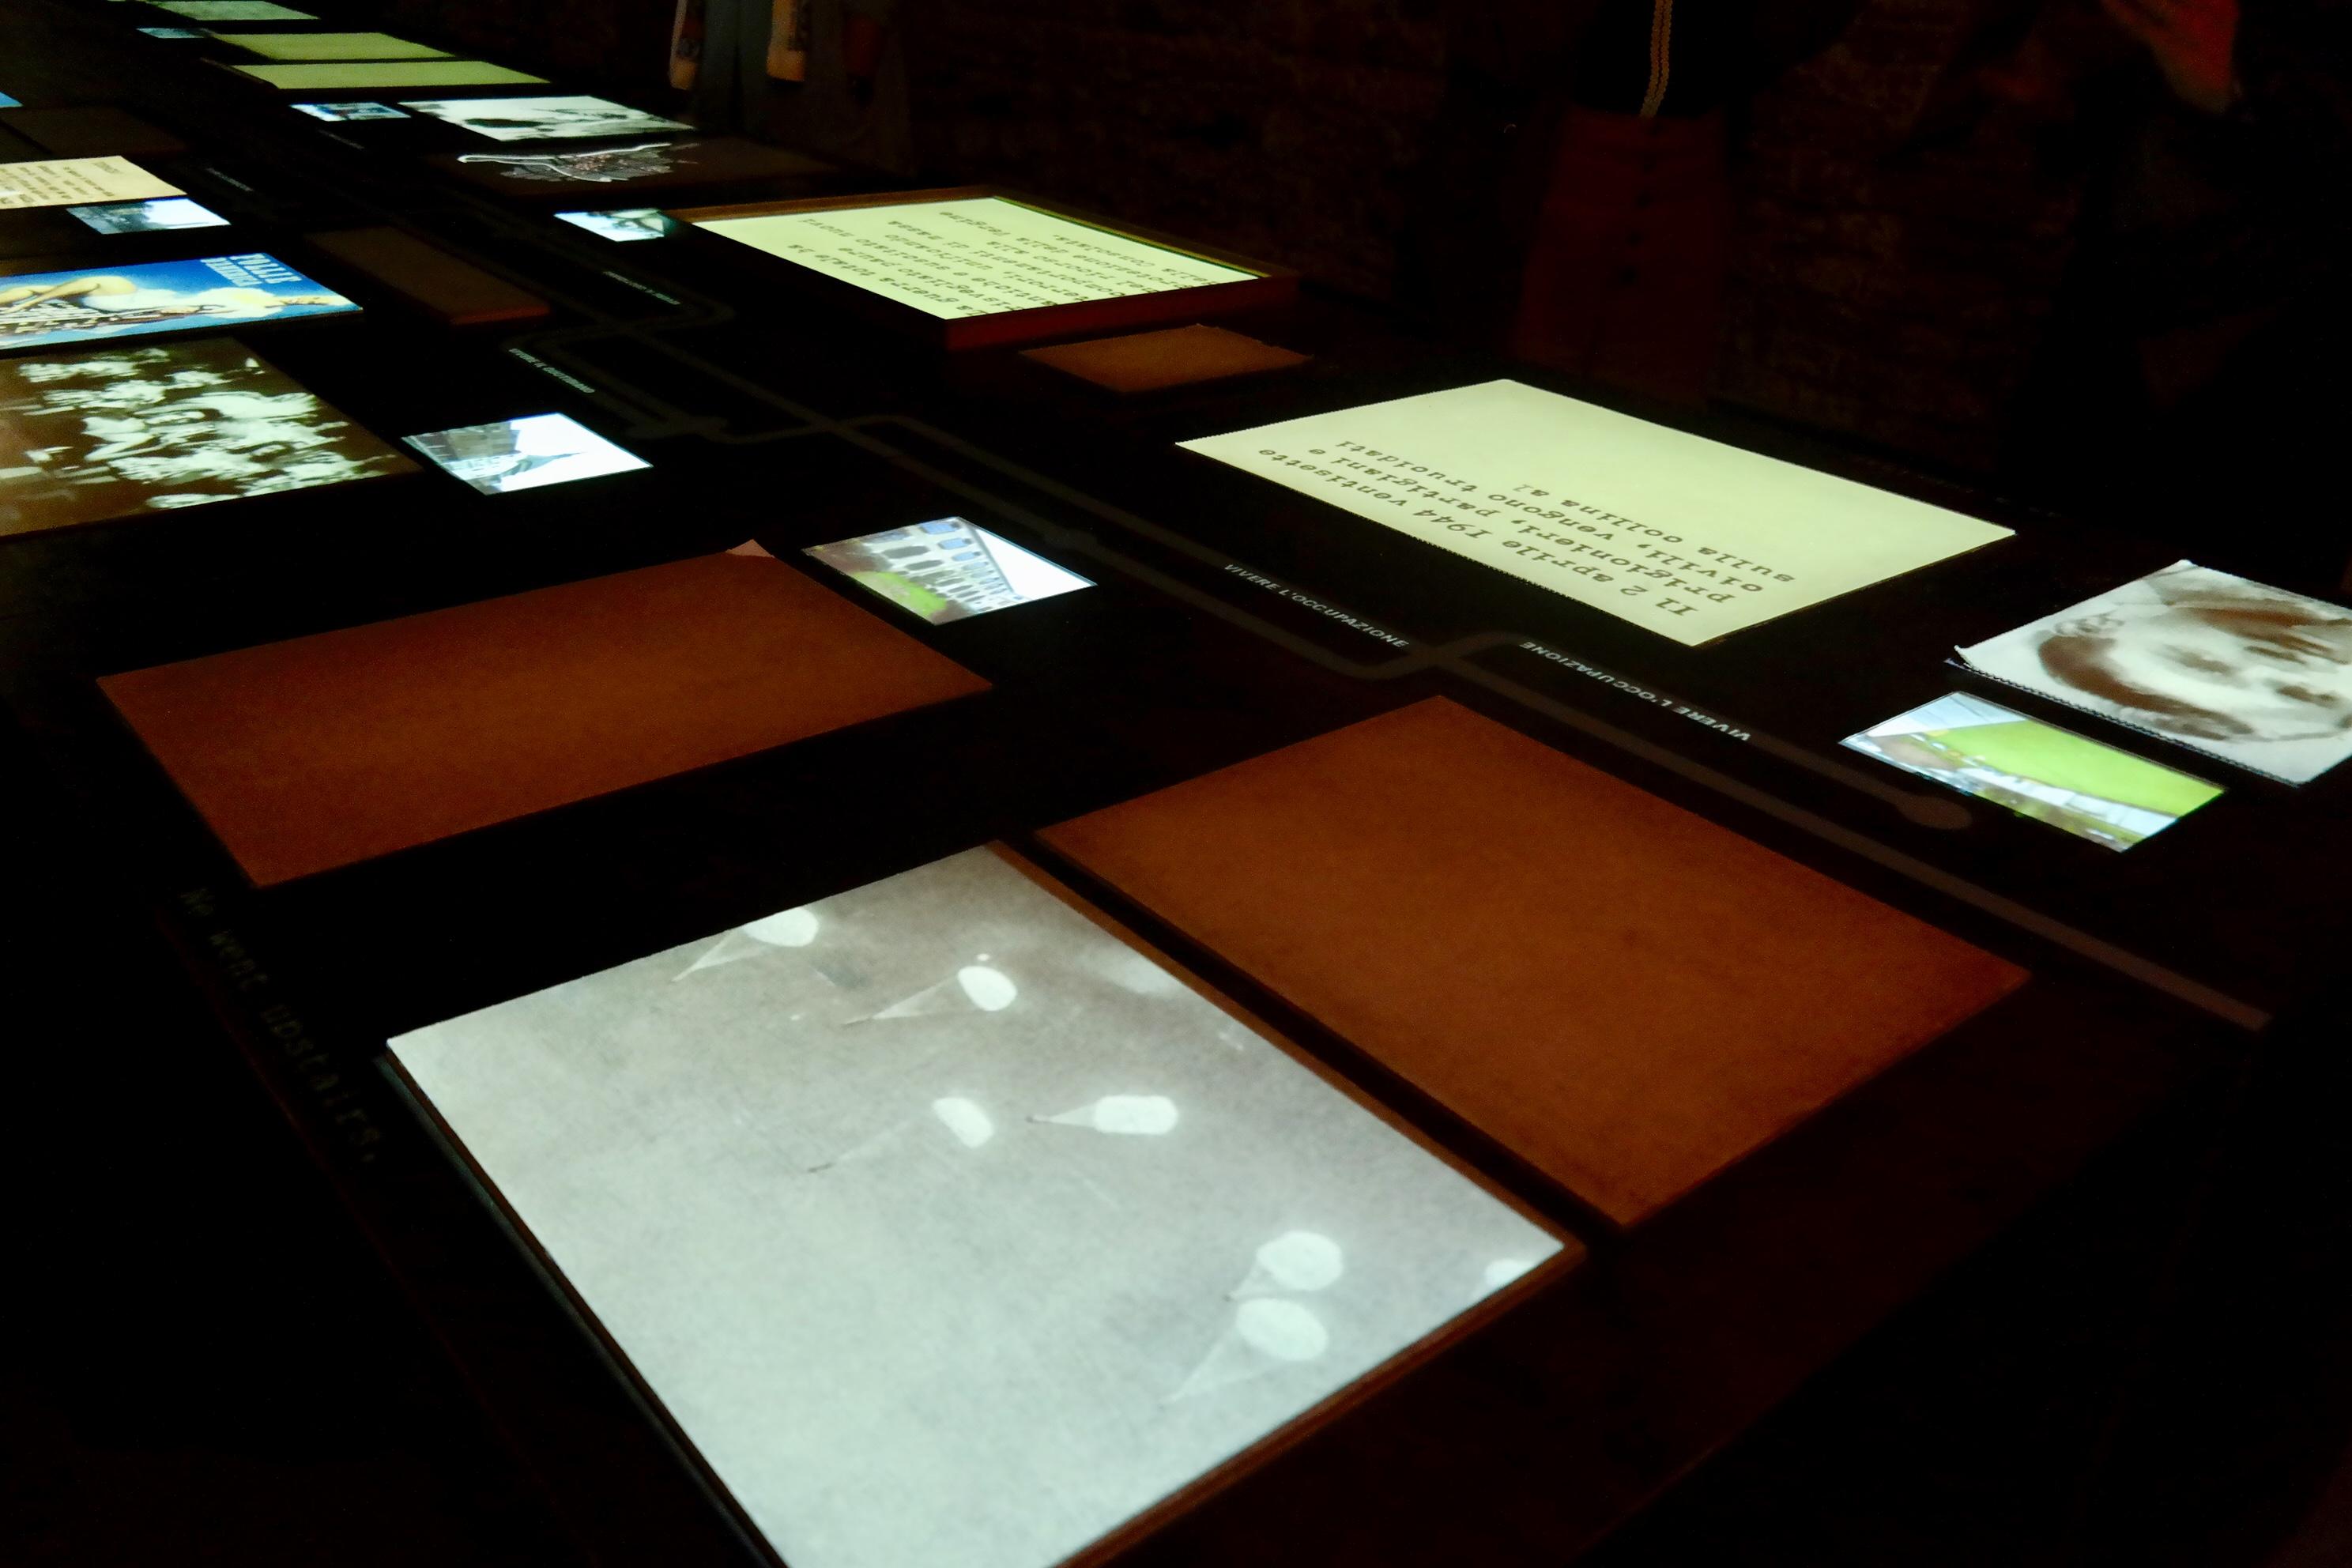 na imagem vê-se uma mesa digital